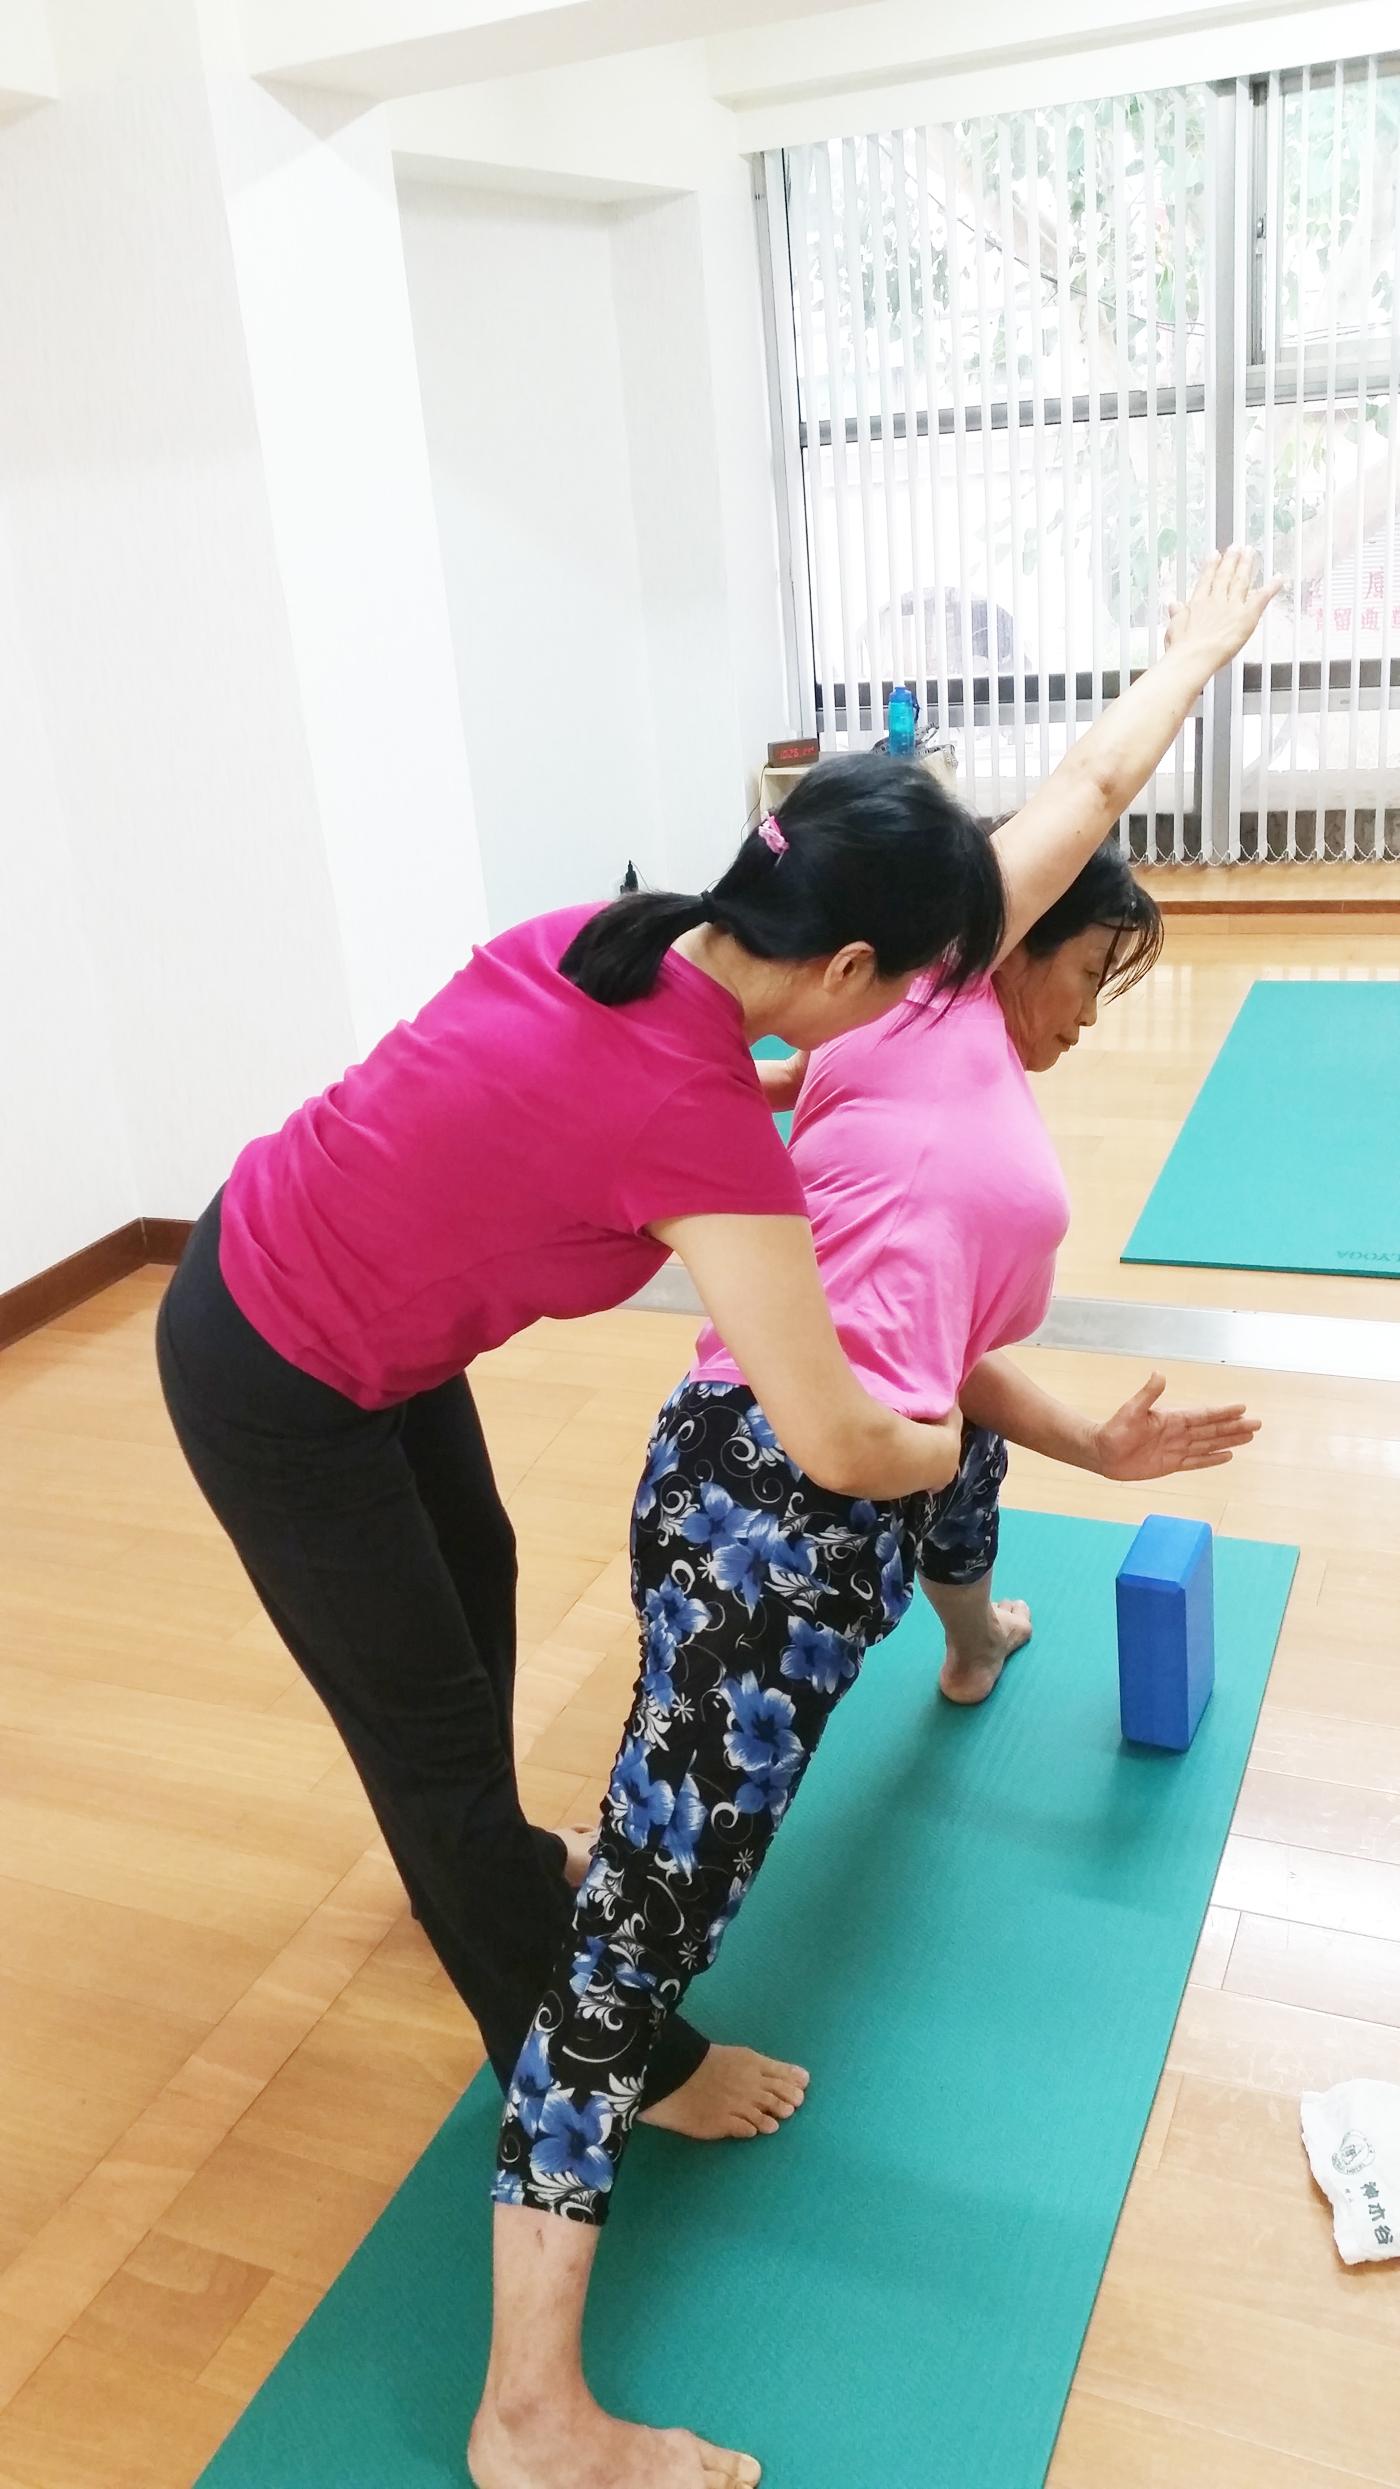 文山區-木柵-yoga-evolution-瑜伽教室-私人推薦上課